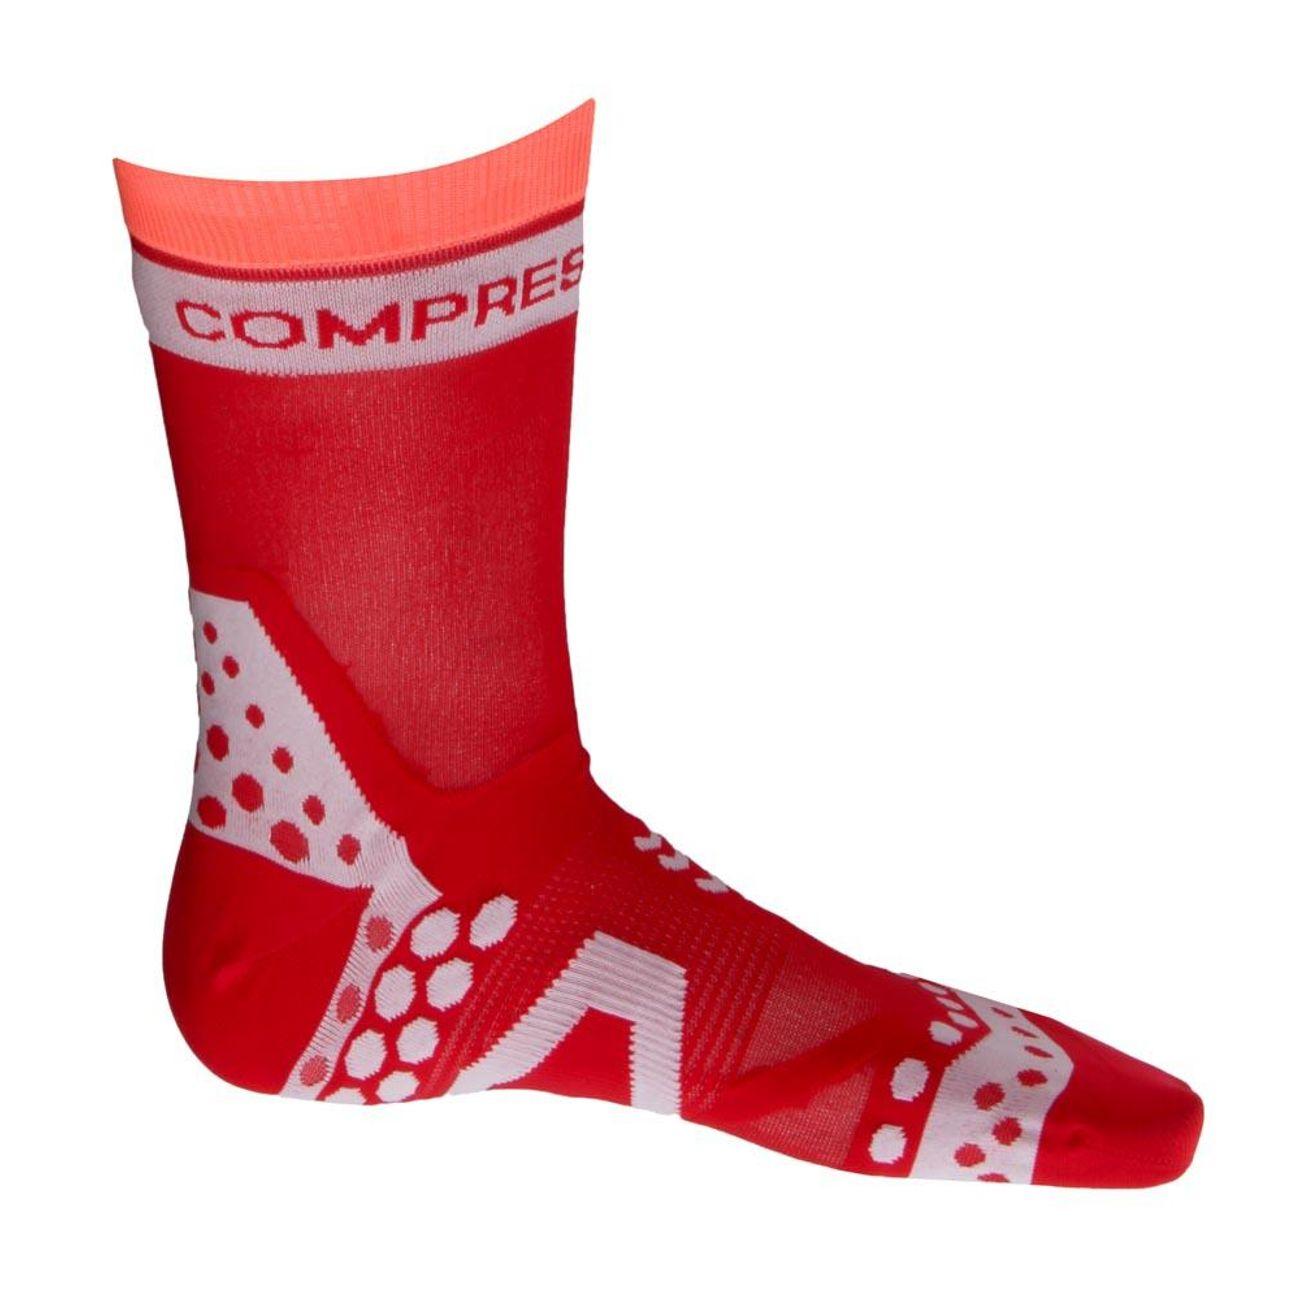 Ultralight Compressport Racing Socks Running Homme Bike 9W2DIEHY